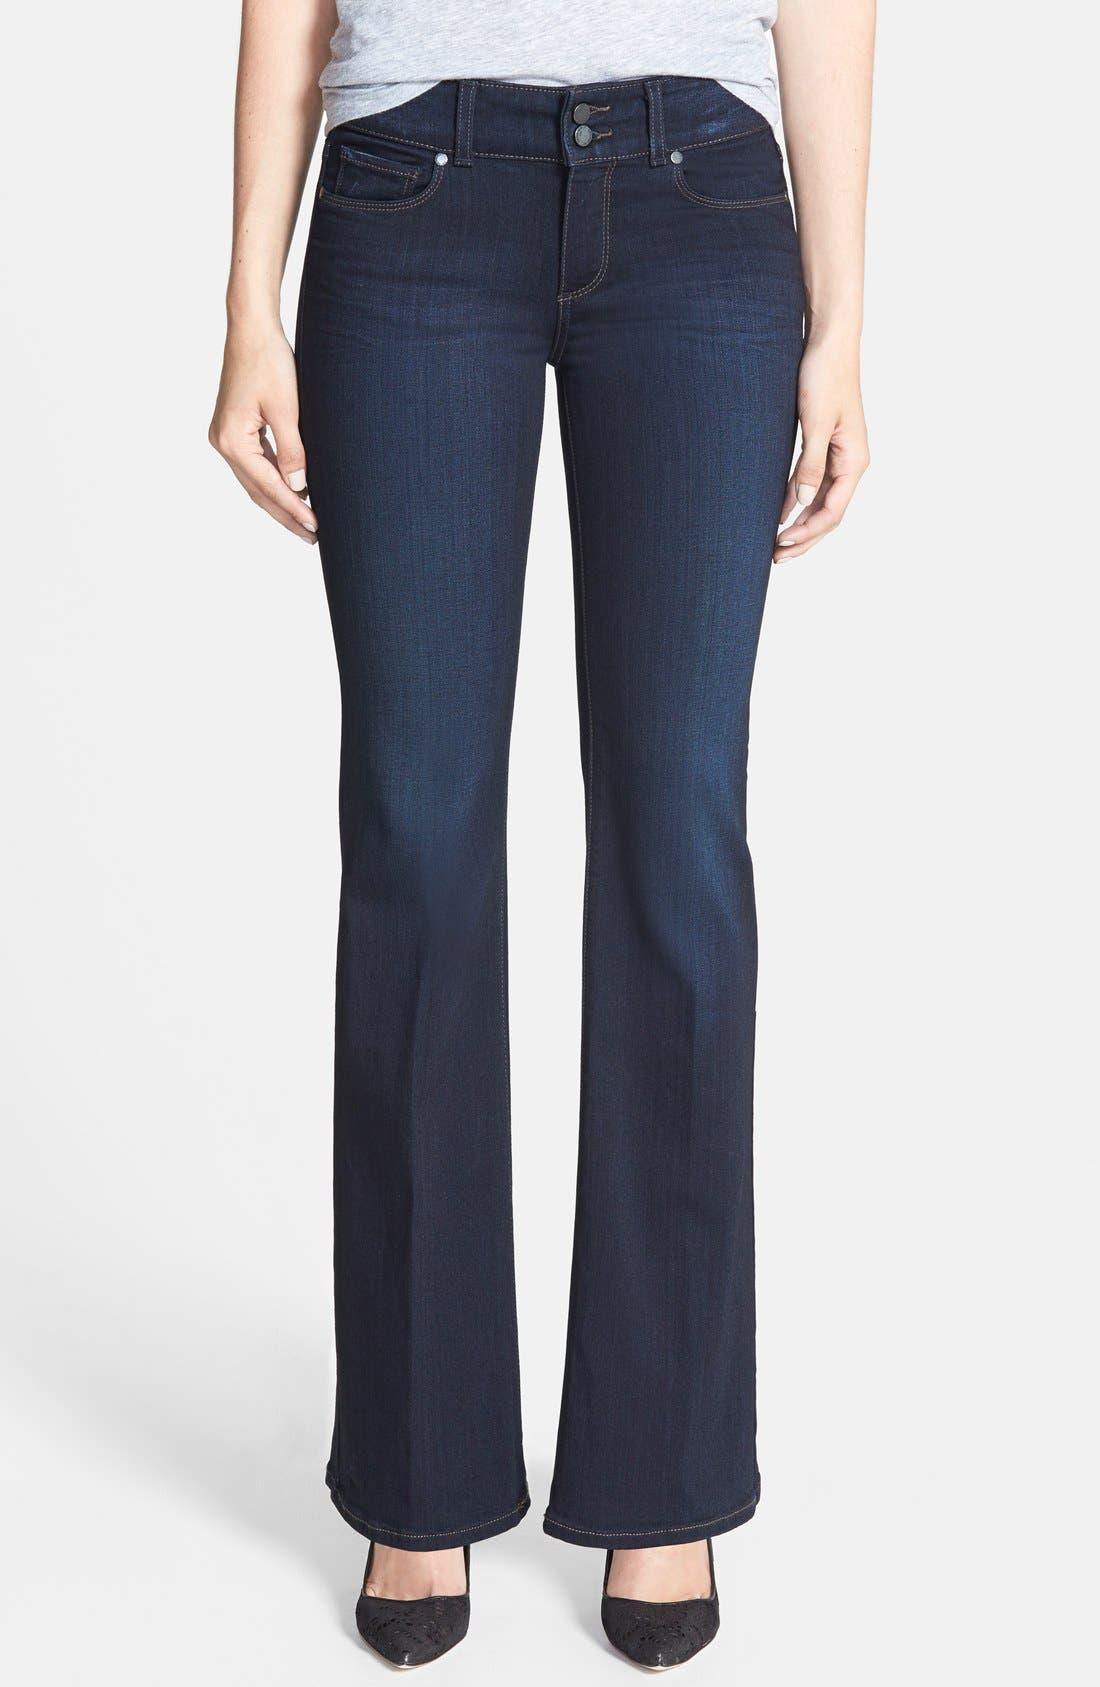 Main Image - PAIGE 'Transcend - Hidden Hills' Bootcut Stretch Jeans (Mona) (Petite)